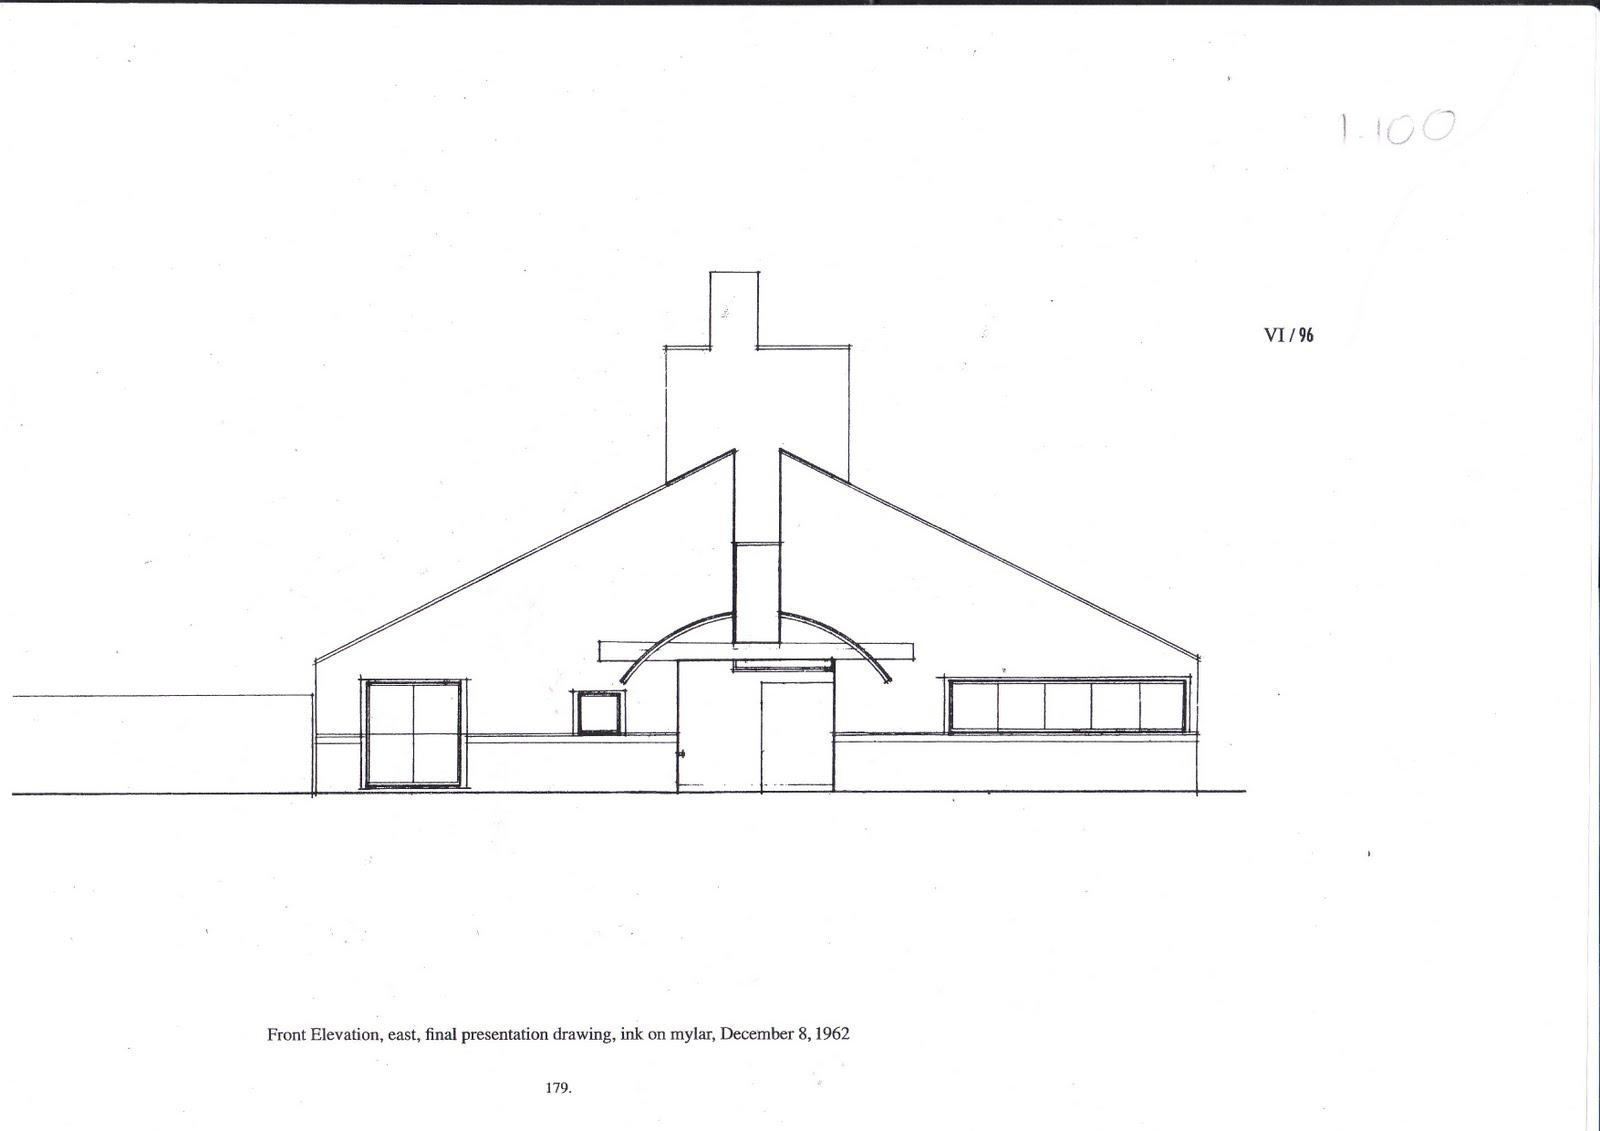 Mother's House Robert Venturi